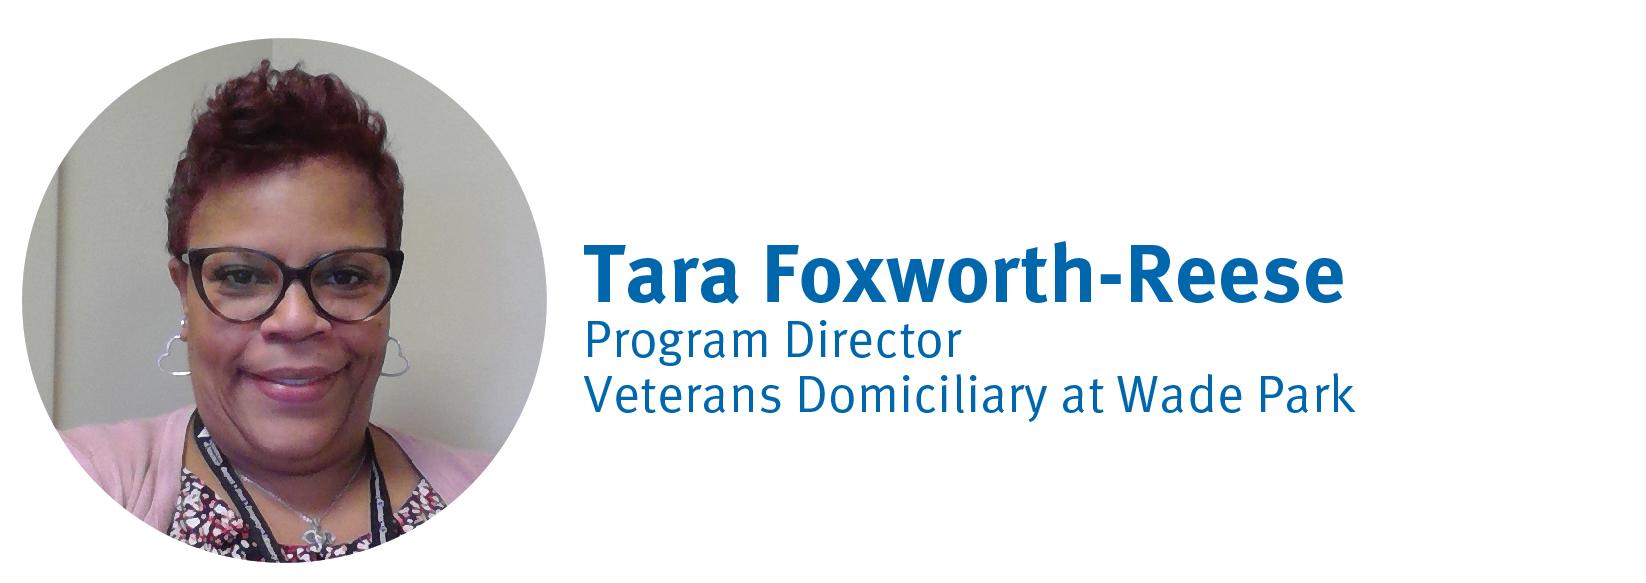 Tara Foxworth-Reese, Volunteers of America Ohio & Indiana